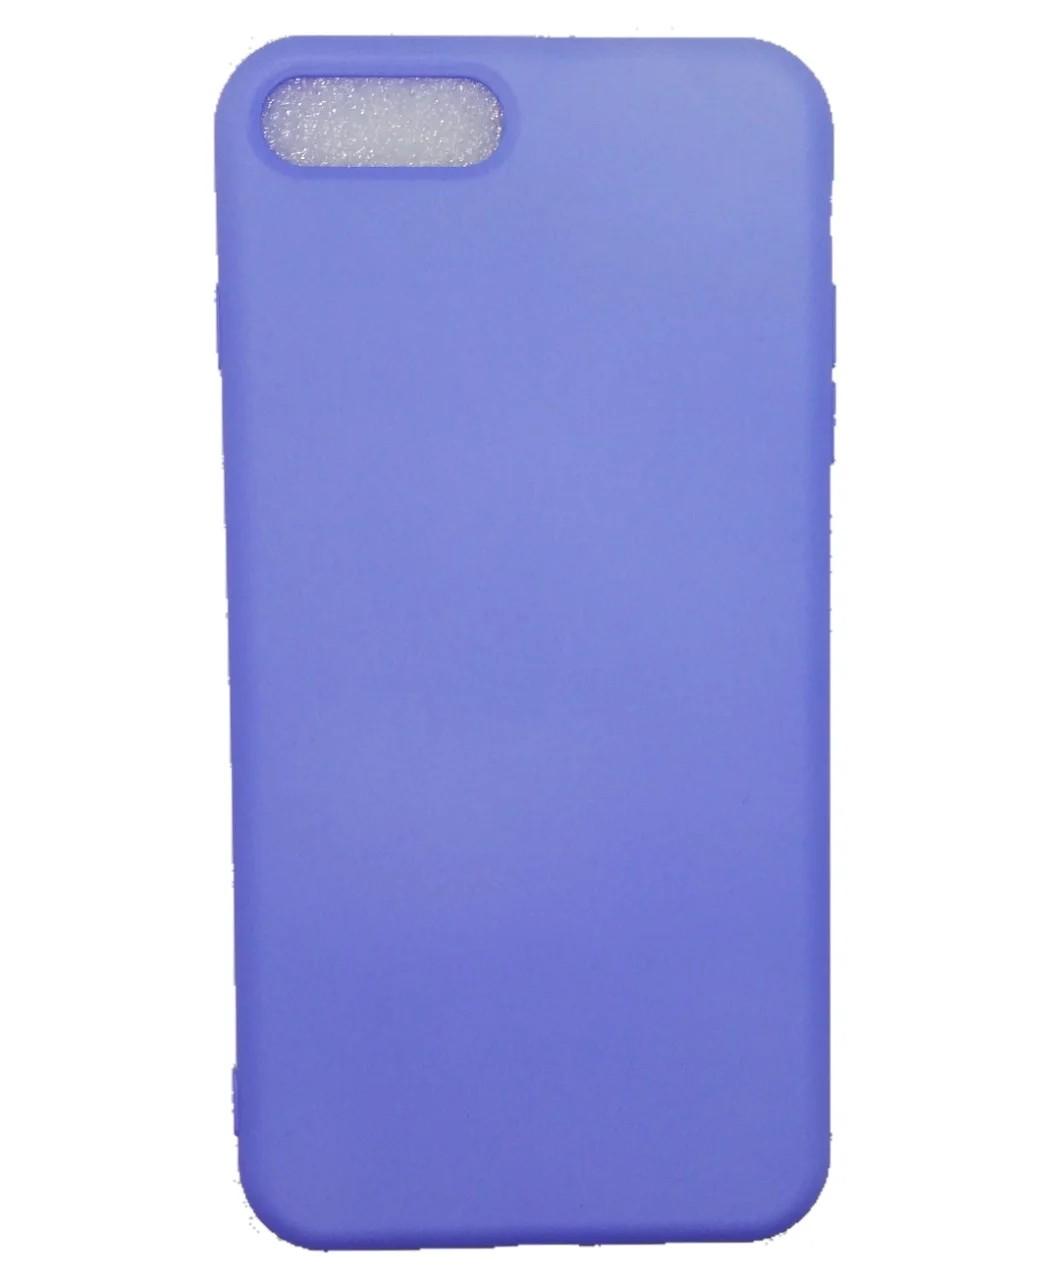 Iphone 7-8 Plus Nano Silikon Mor Kılıf